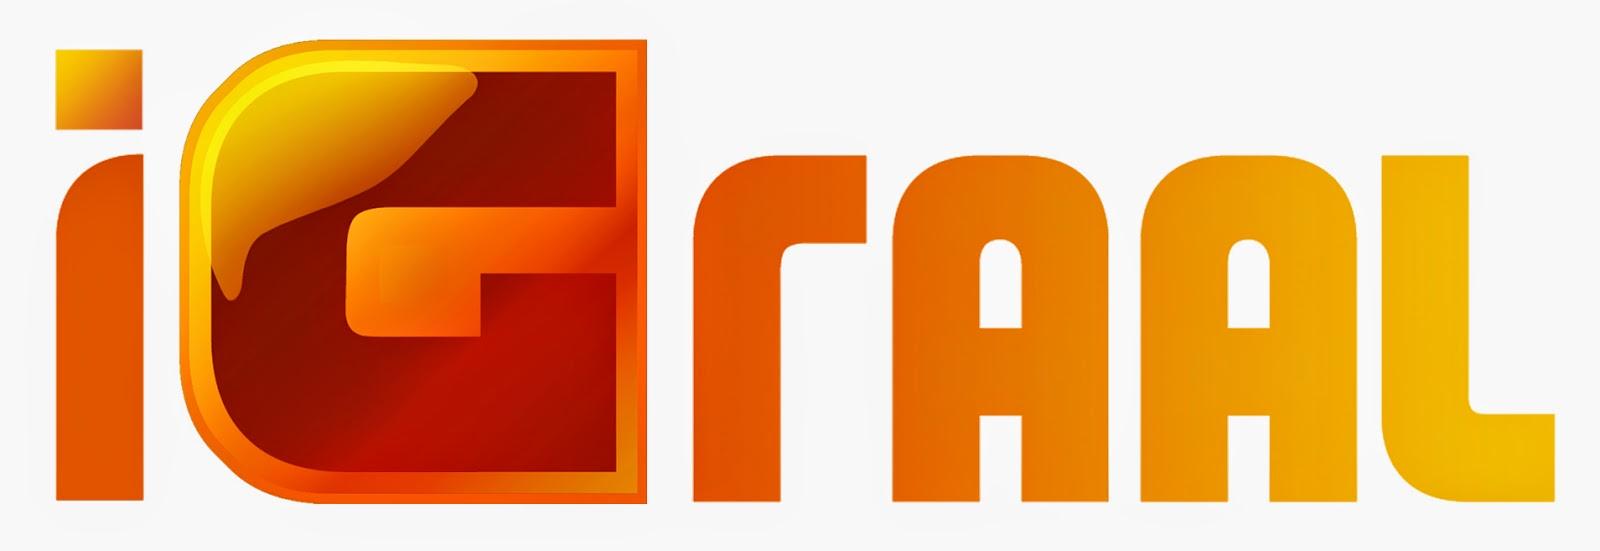 http://fr.igraal.com/#parrain=kreenmissboop